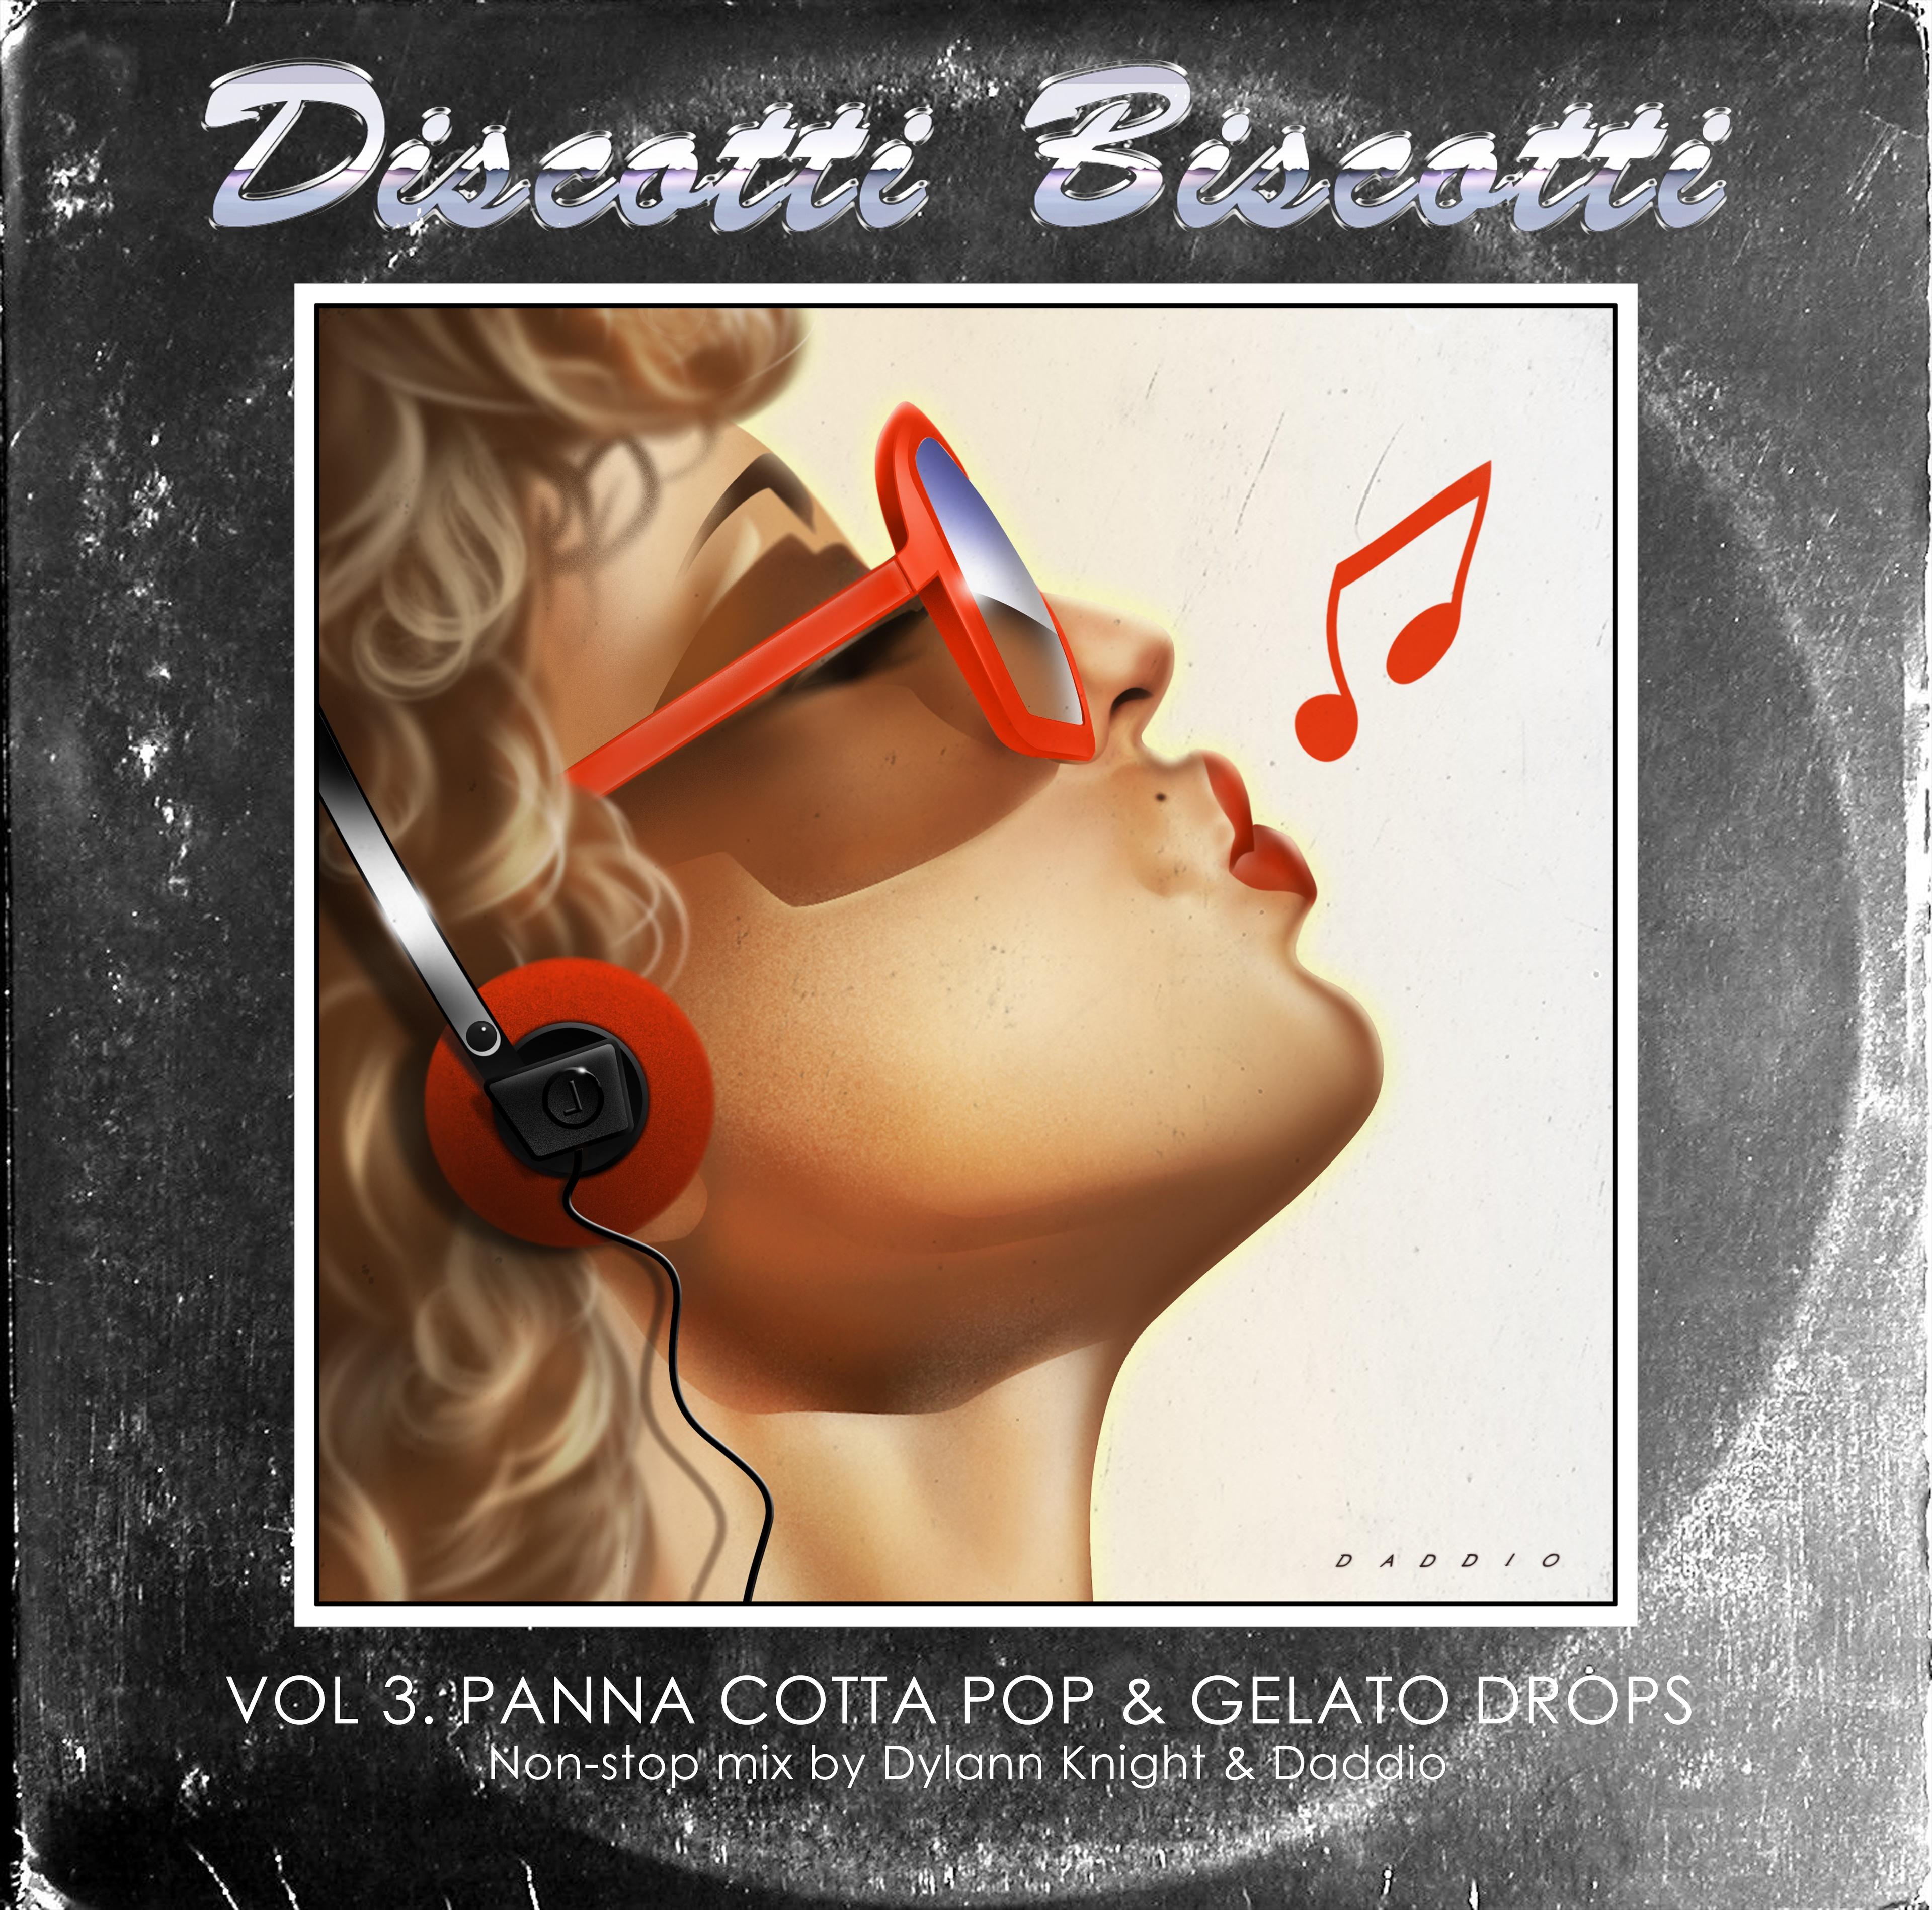 Discotti Biscotti CD 2.jpg